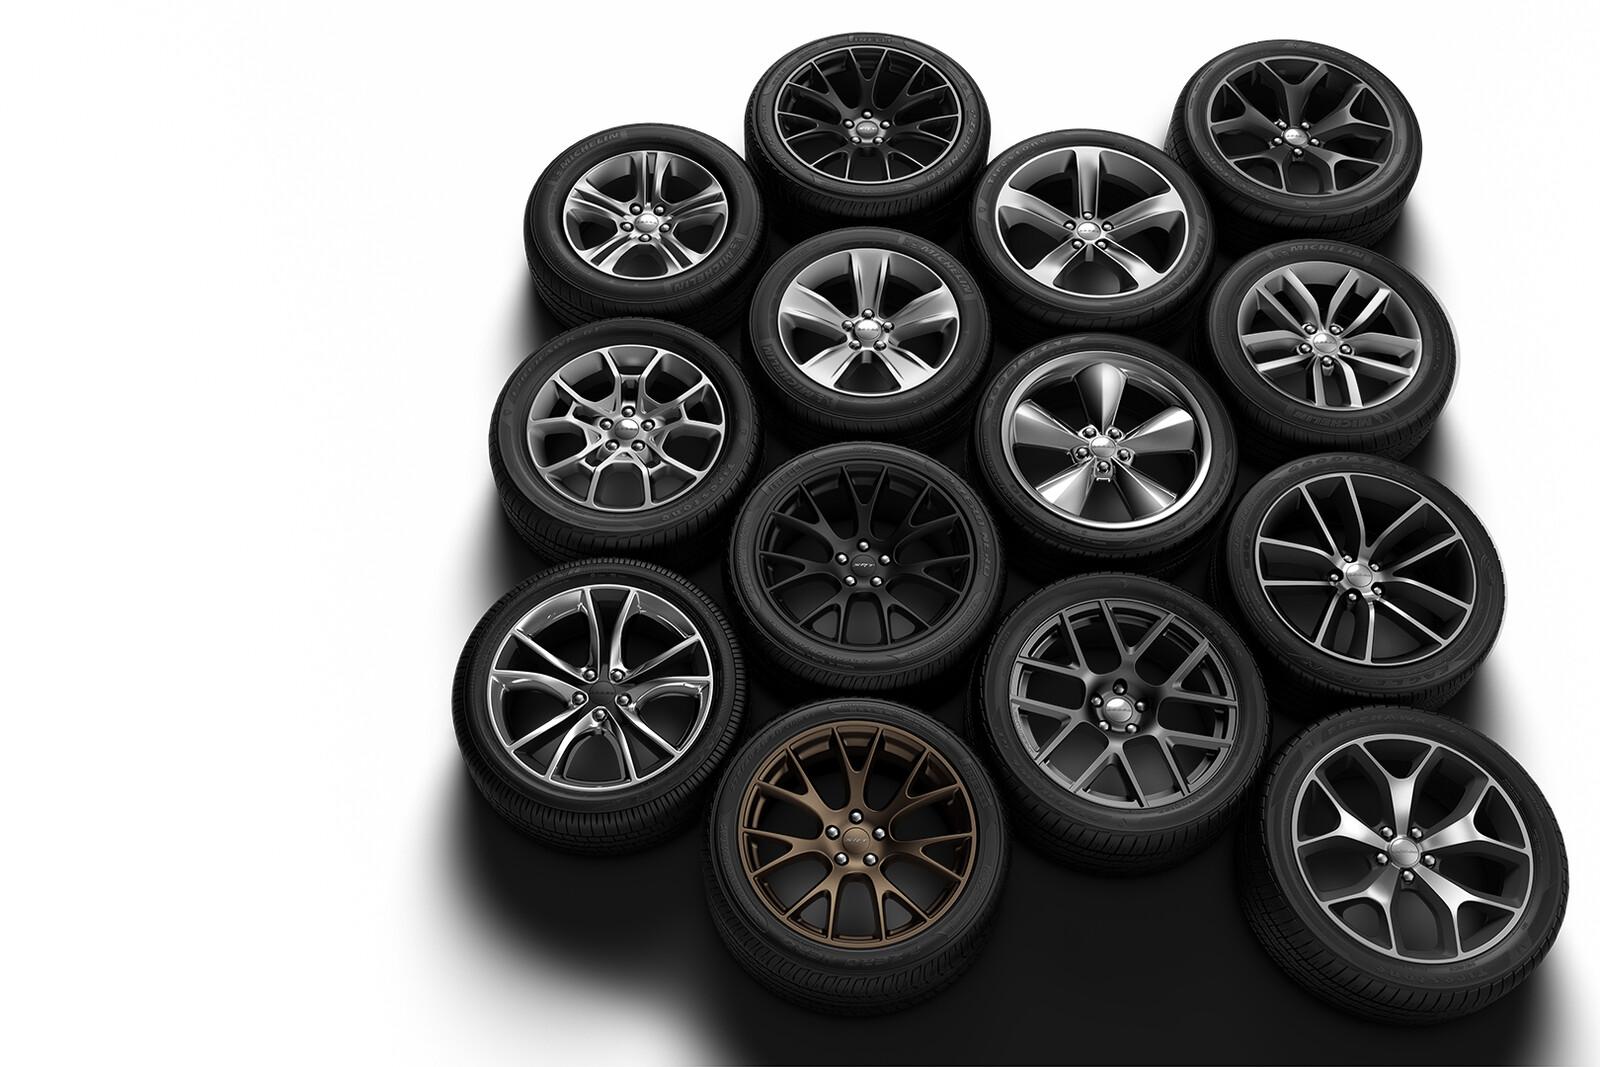 Dodge Challenger Wheels & Tires: Fully CG Tasks: Materials, Lighting, & Retouching